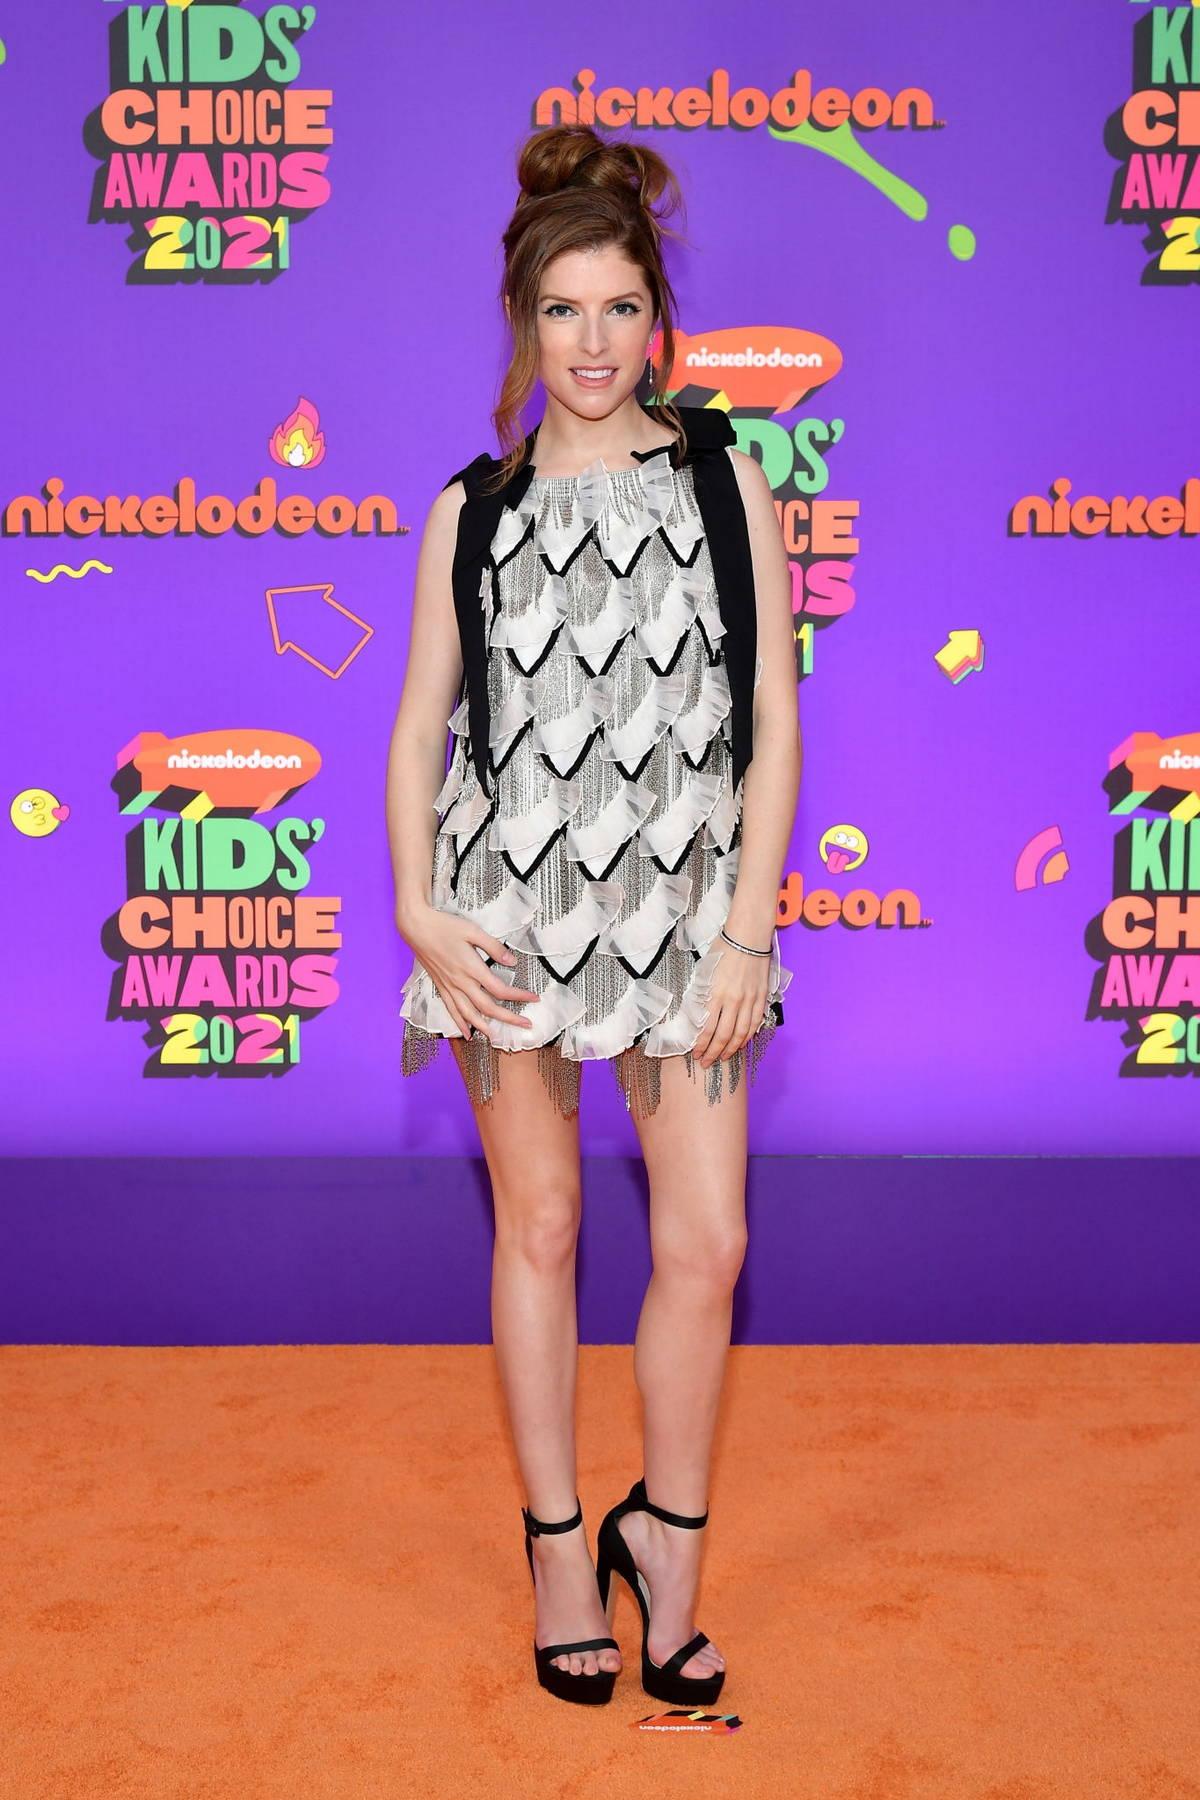 Anna Kendrick attends Nickelodeon's Kids' Choice Awards 2021 at Barker Hangar in Santa Monica, California